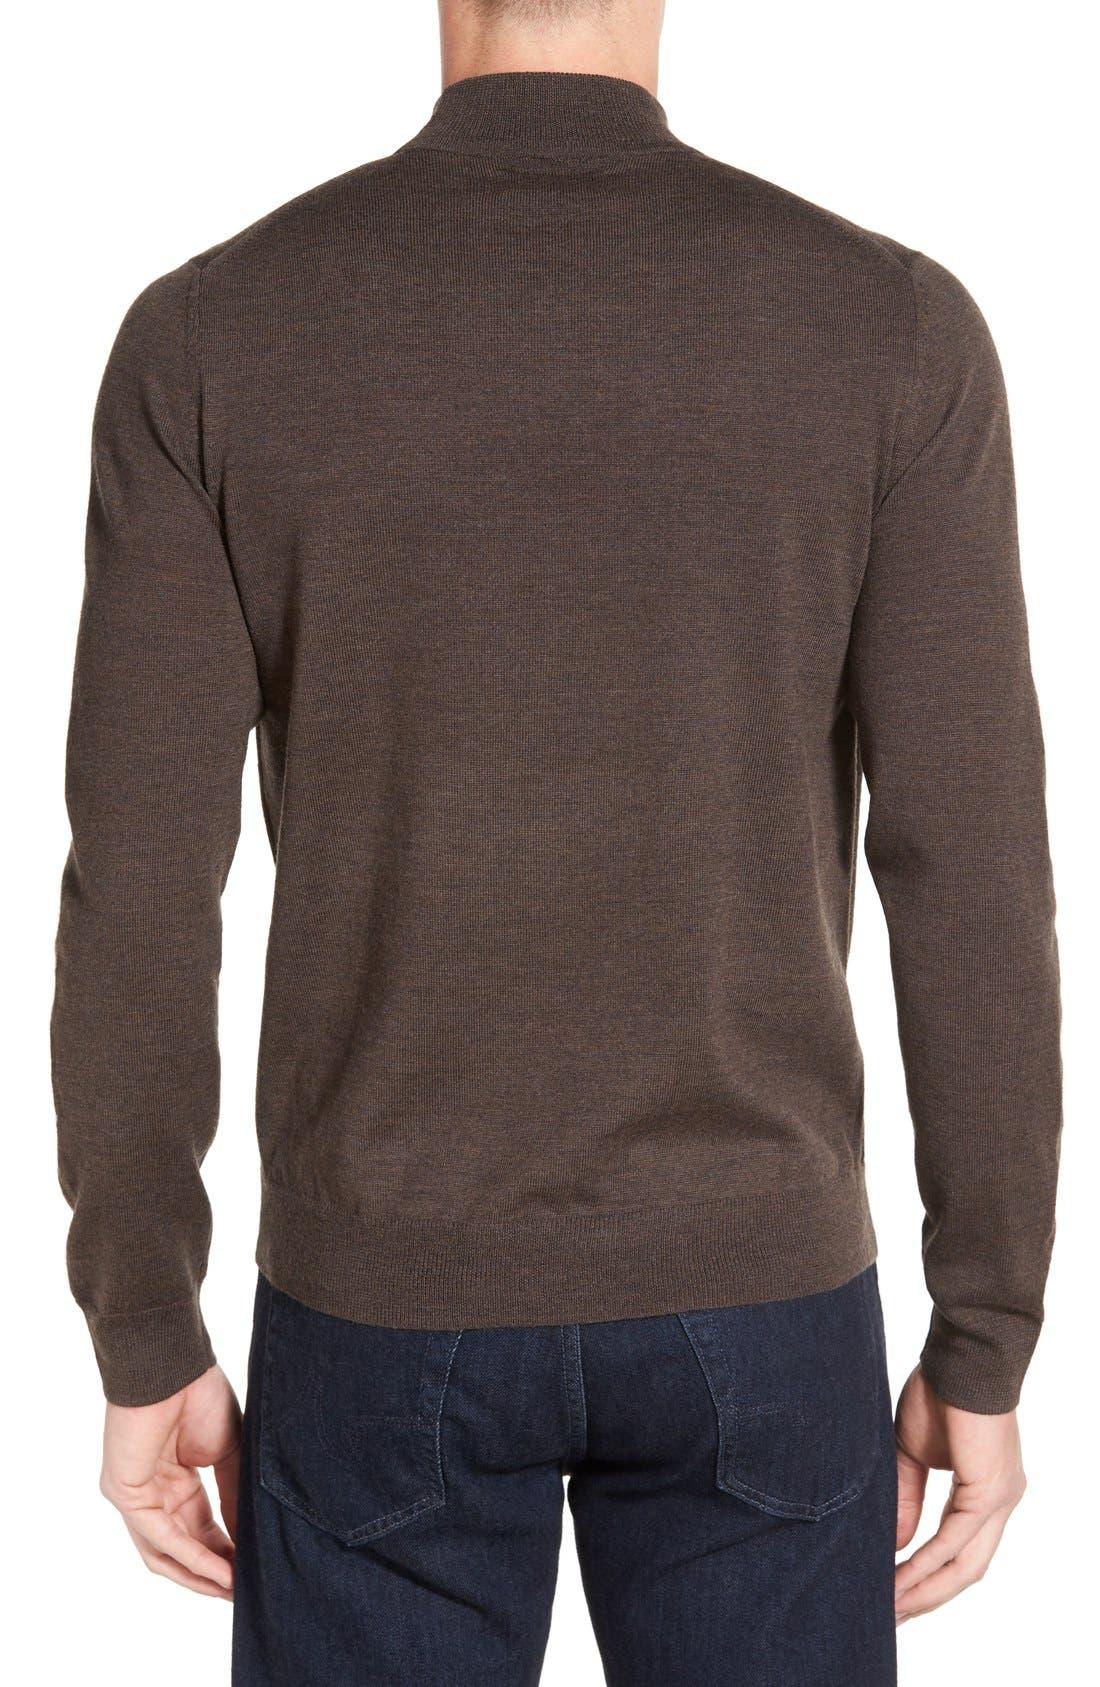 Alternate Image 2  - Nordstrom Mock Neck Merino Wool Sweater (Regular & Tall)